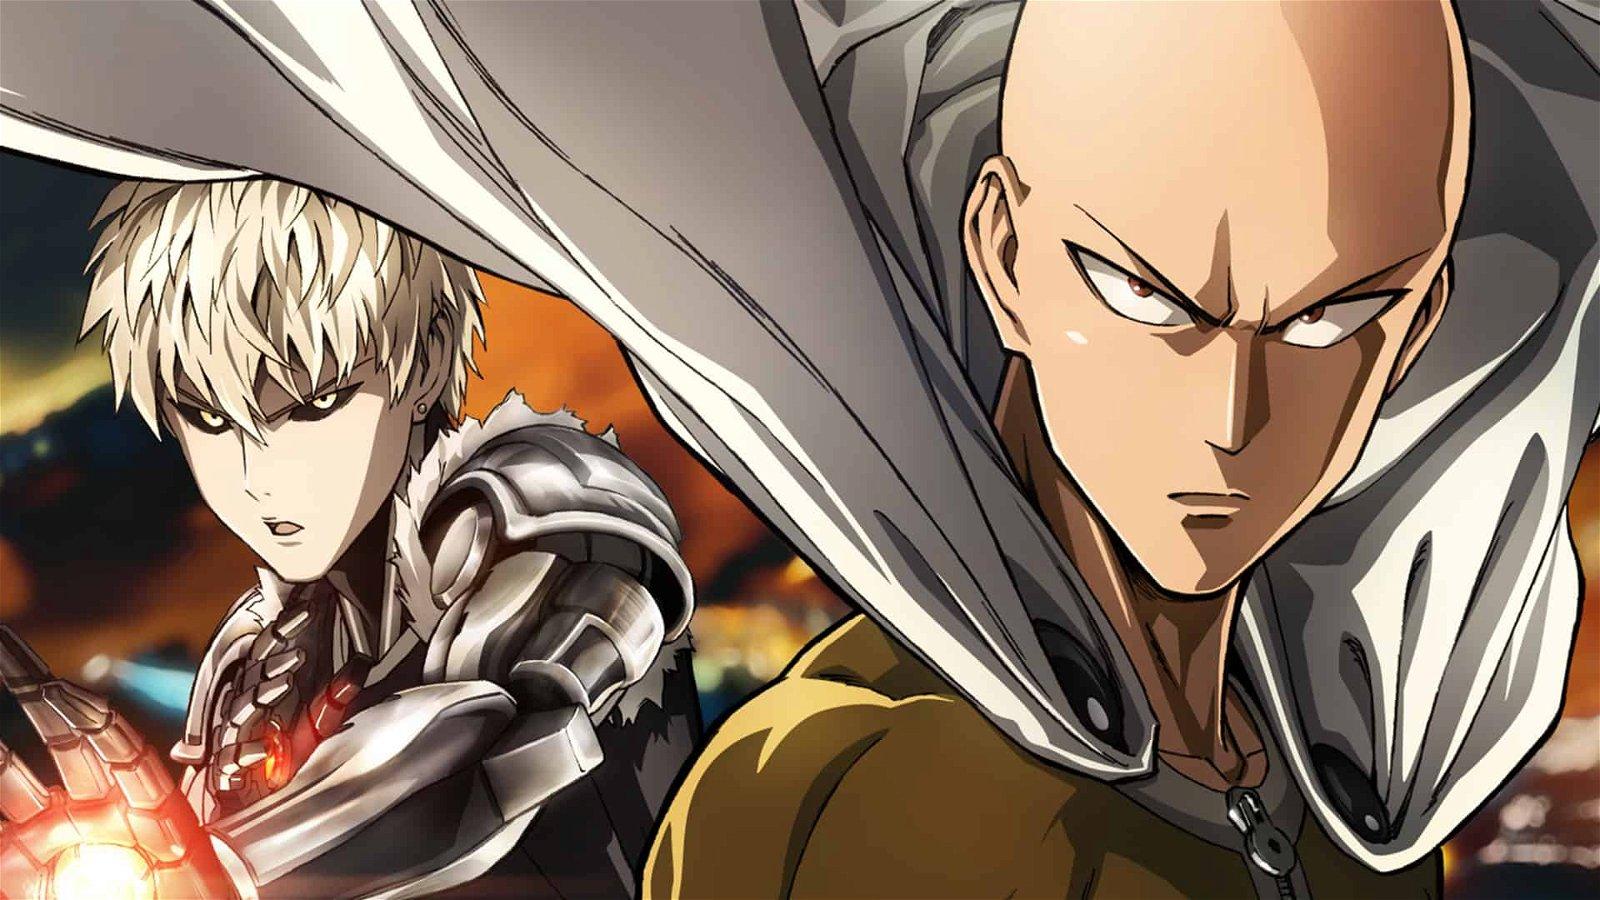 VIZ Media Announces Long-Awaited One-Punch Man Season 2 1